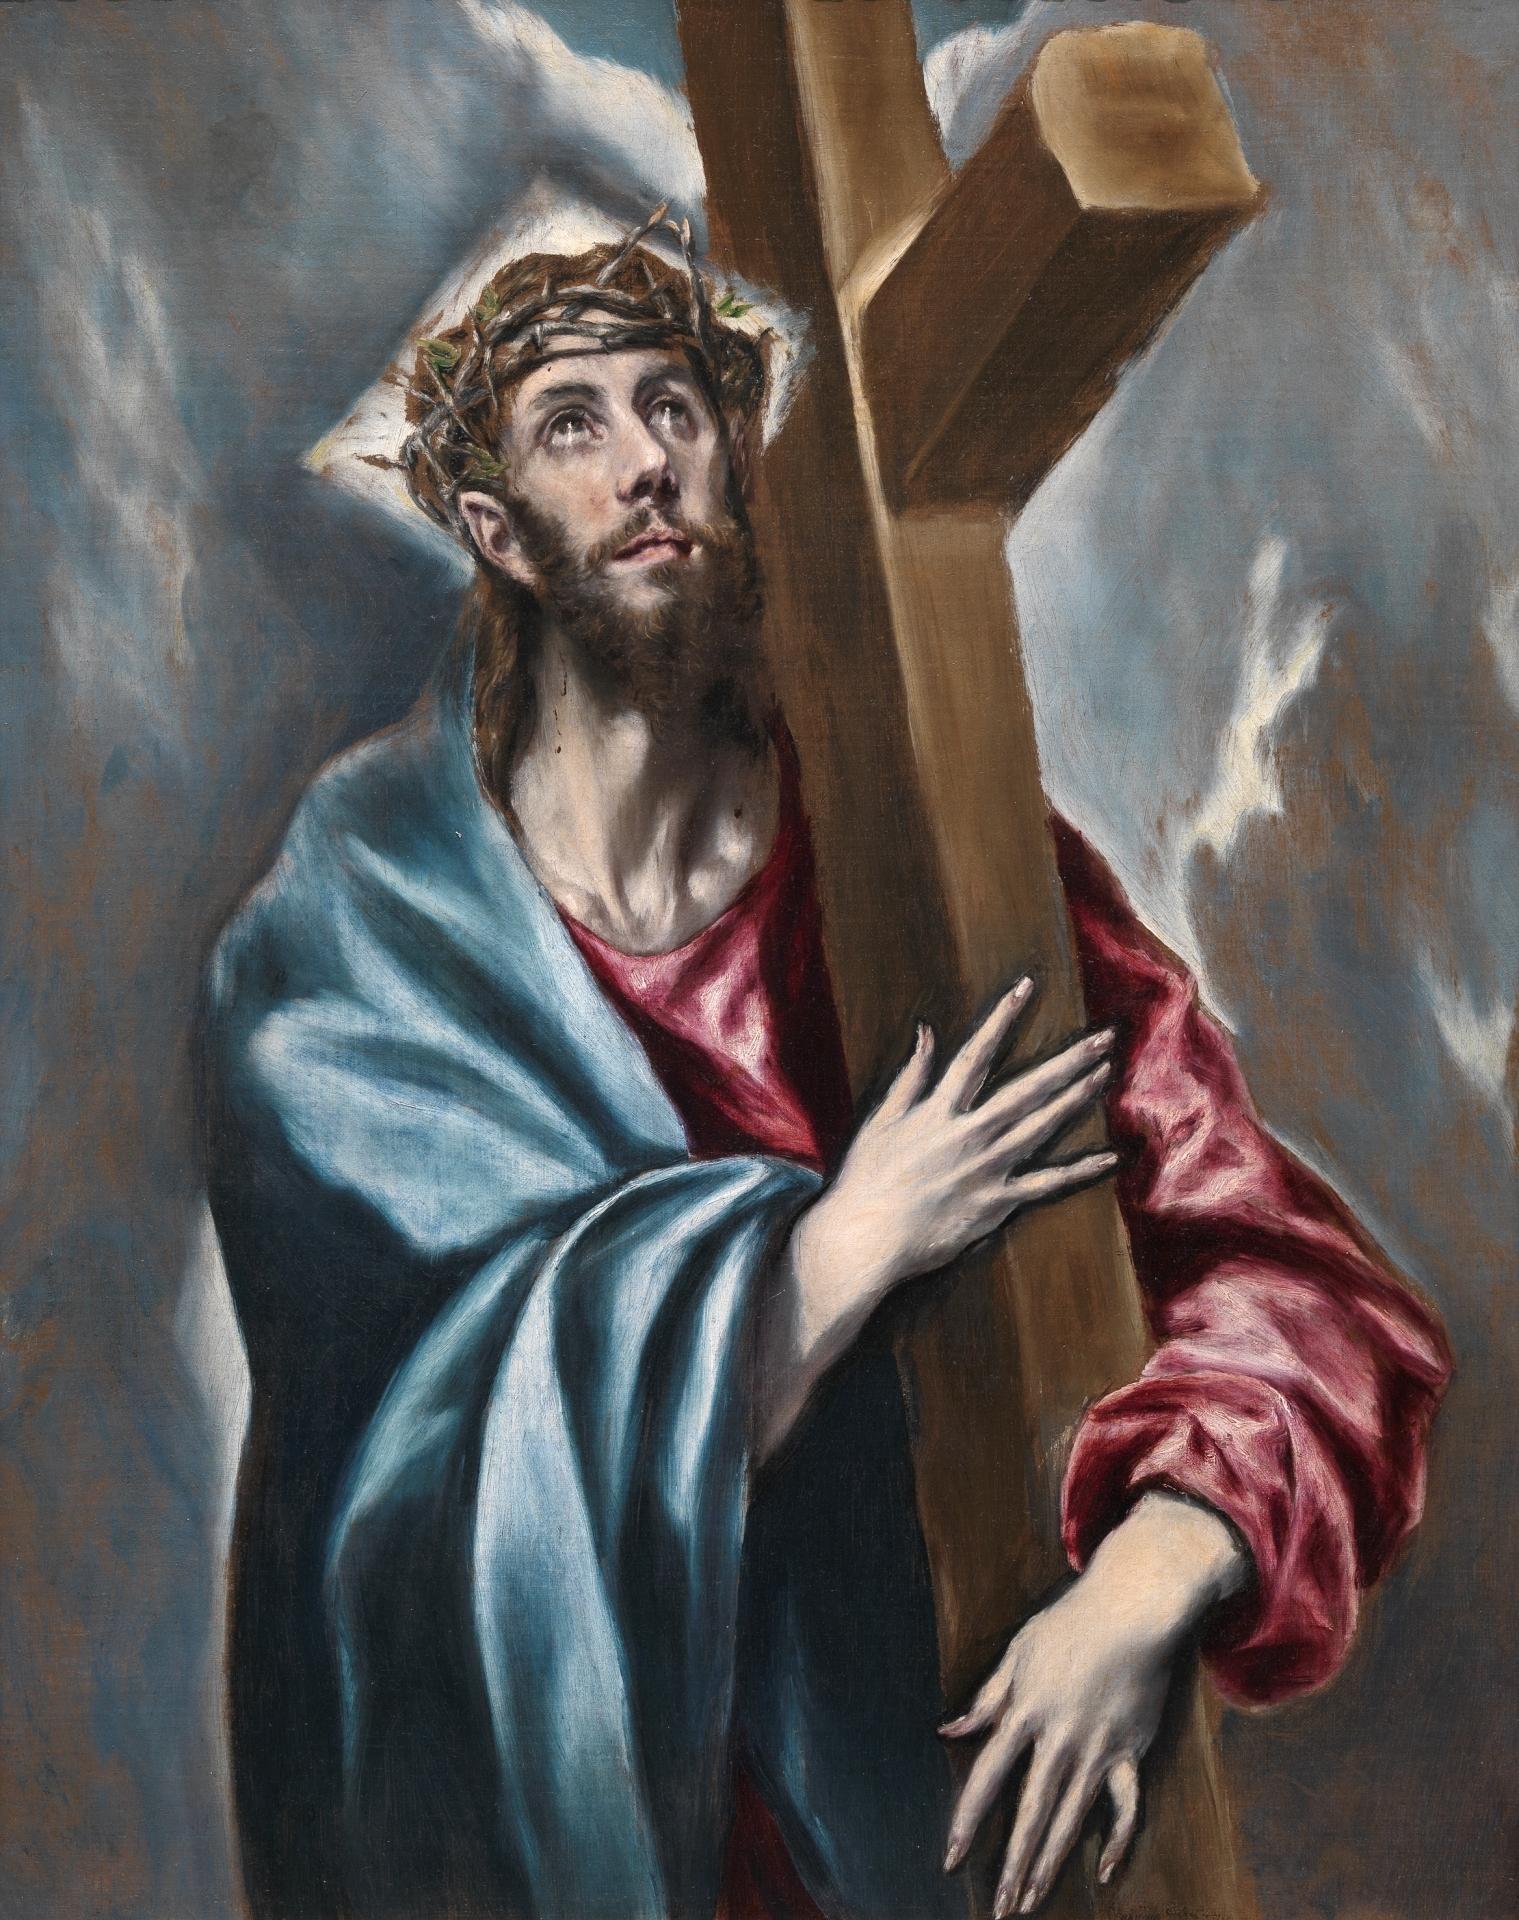 Cristo abrazado a la cruz  Coleccin  Museo Nacional del Prado